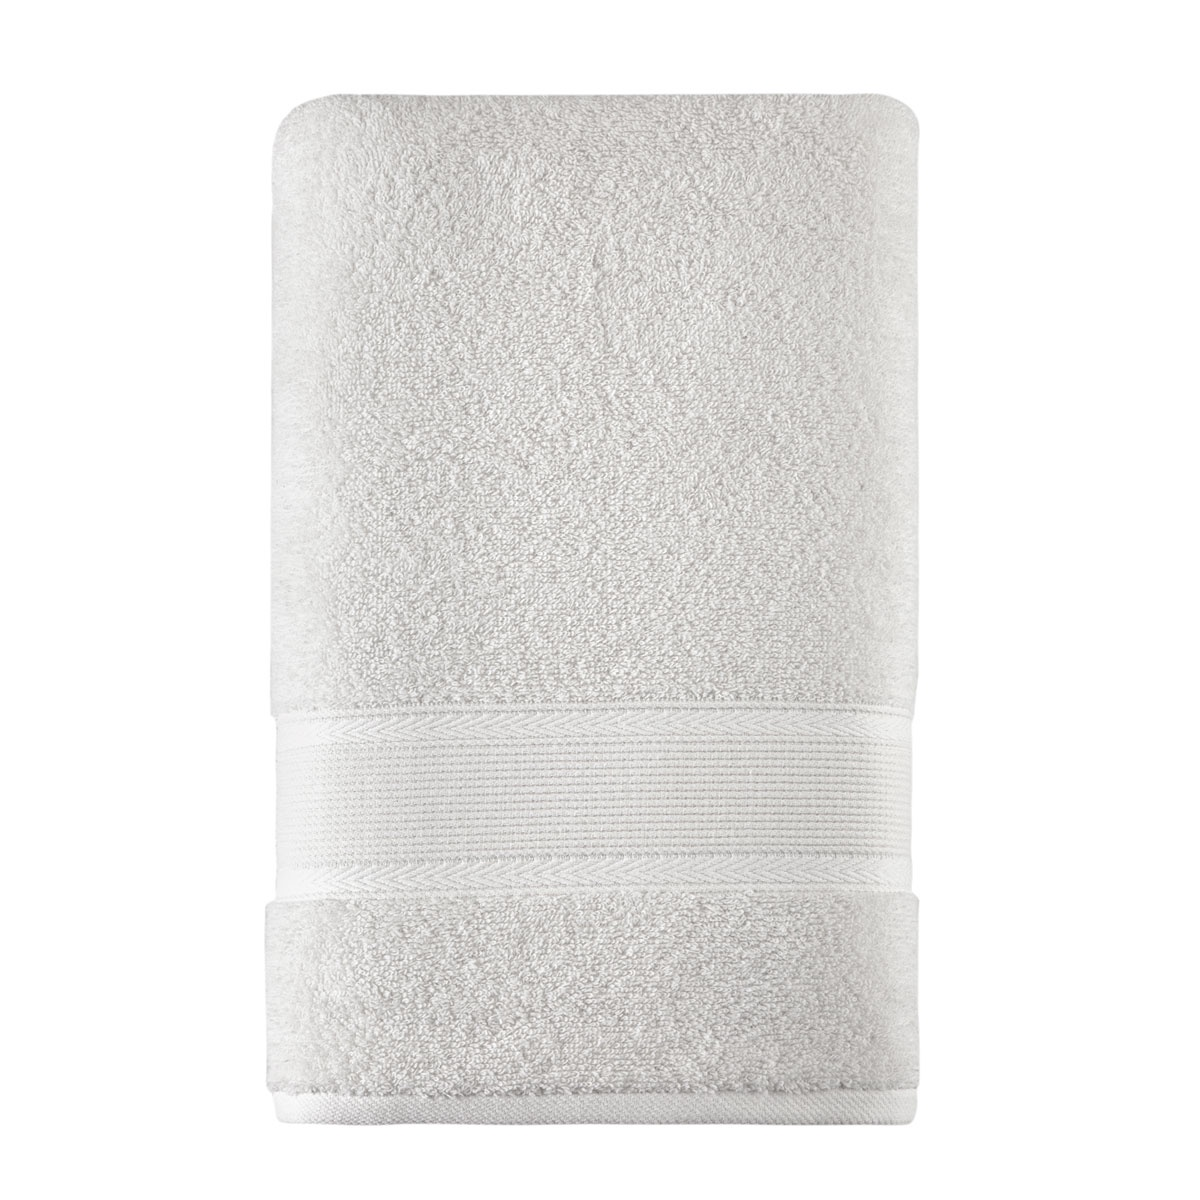 цена Полотенце Arya 50X90 Solo Soft белый онлайн в 2017 году